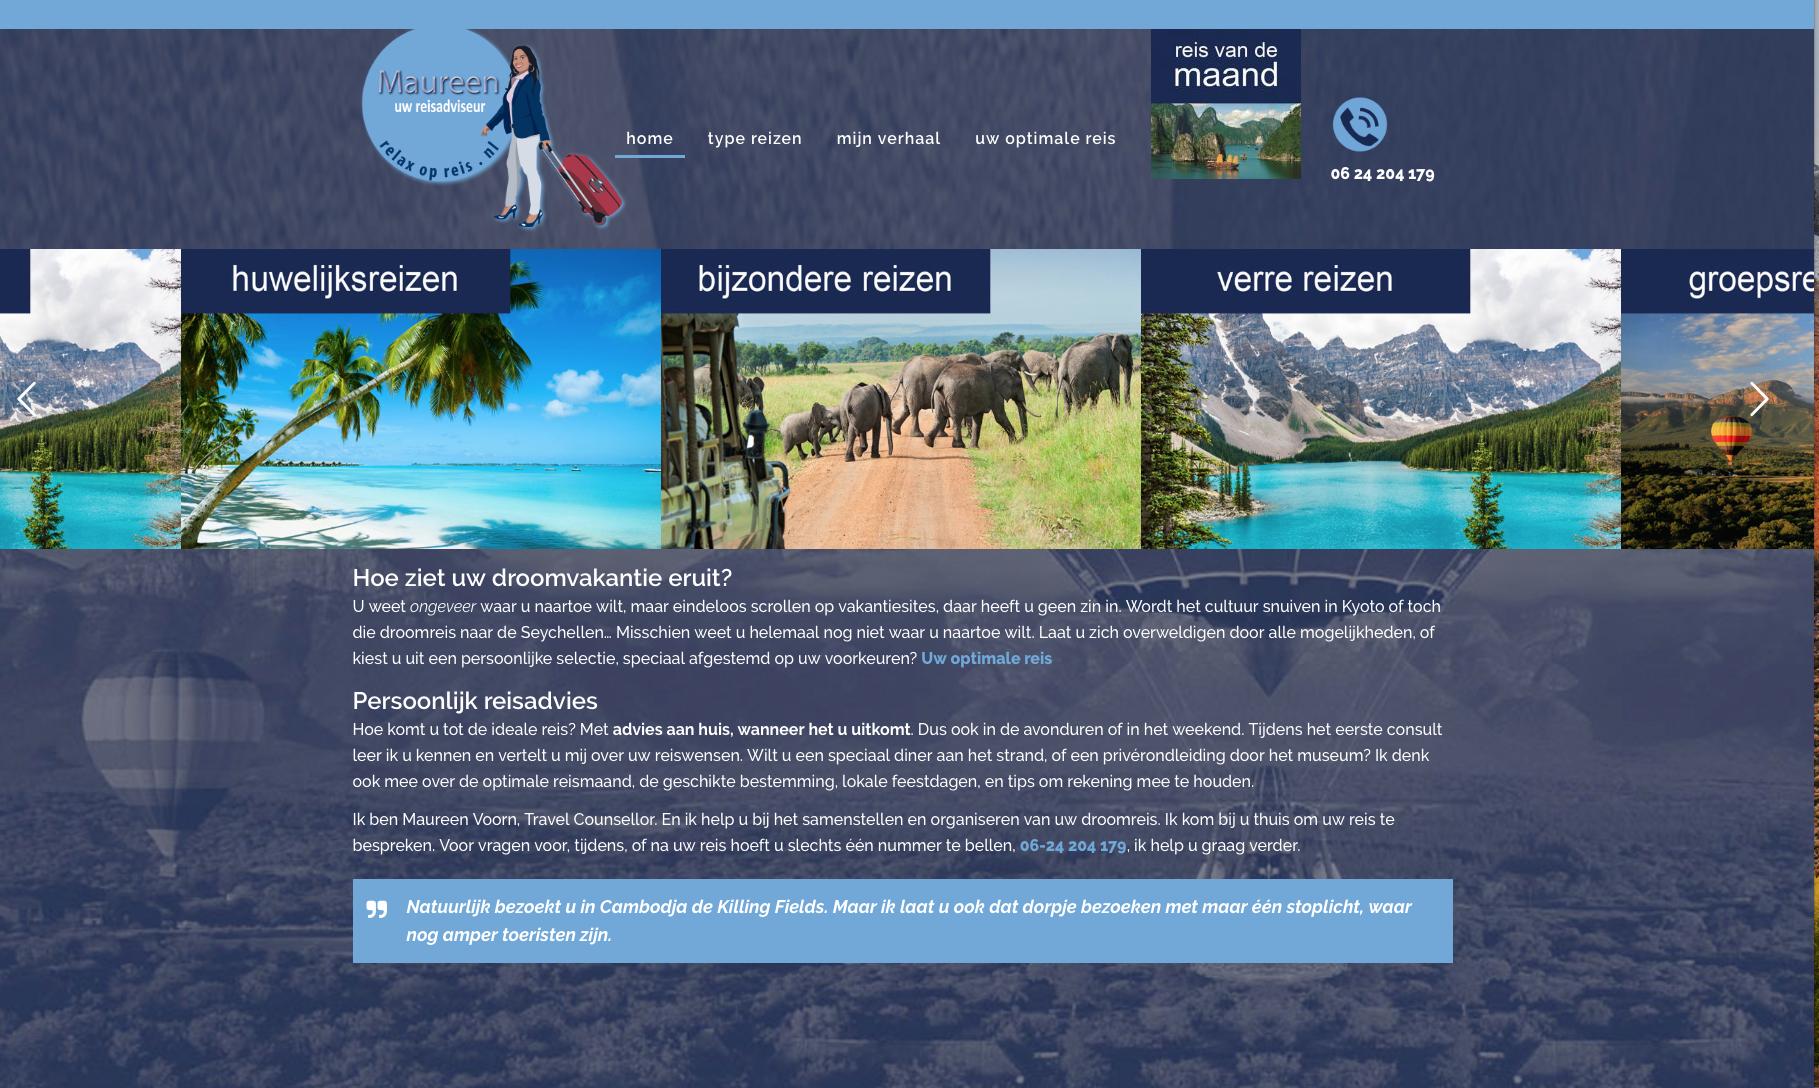 WebMagix-portfolio-relax-op-reis